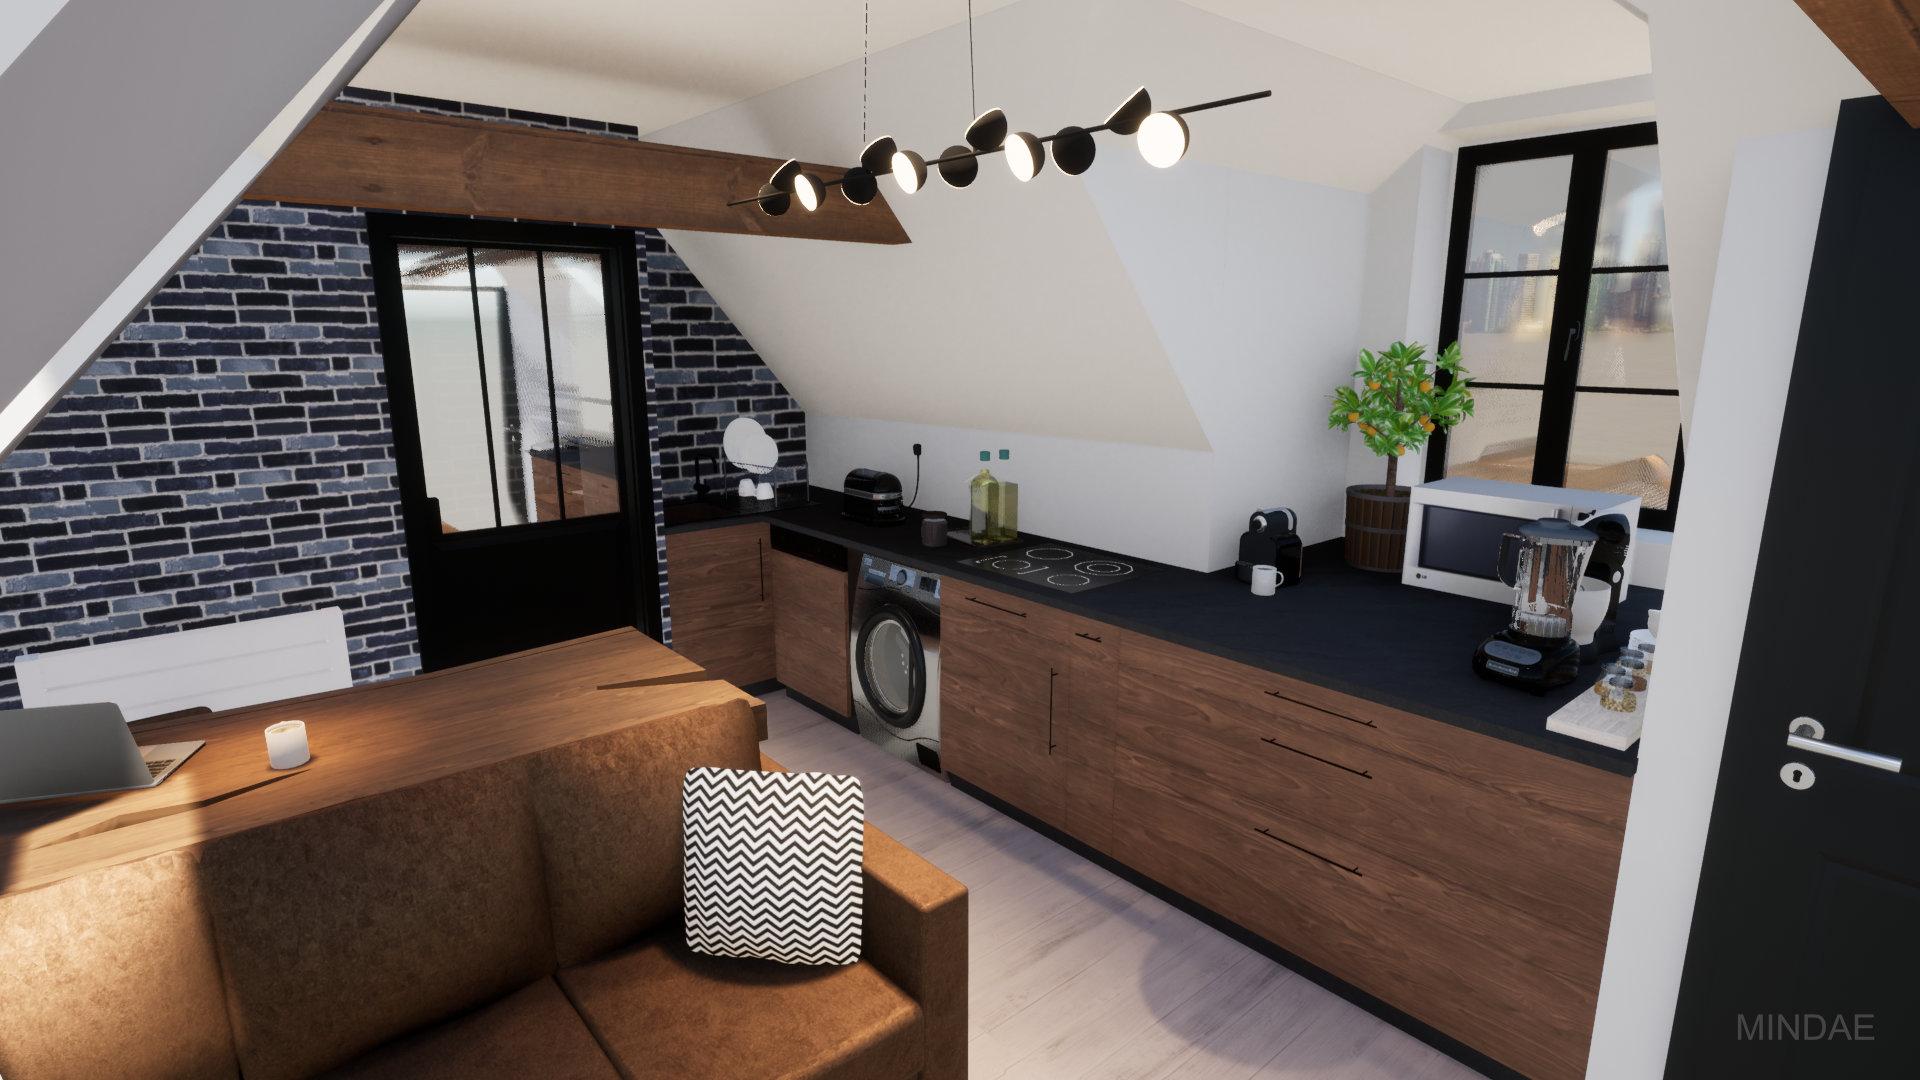 Mindae_Giang_Combles_Appartement_studio_sejour_cuisine_mansarde_toiture (3)